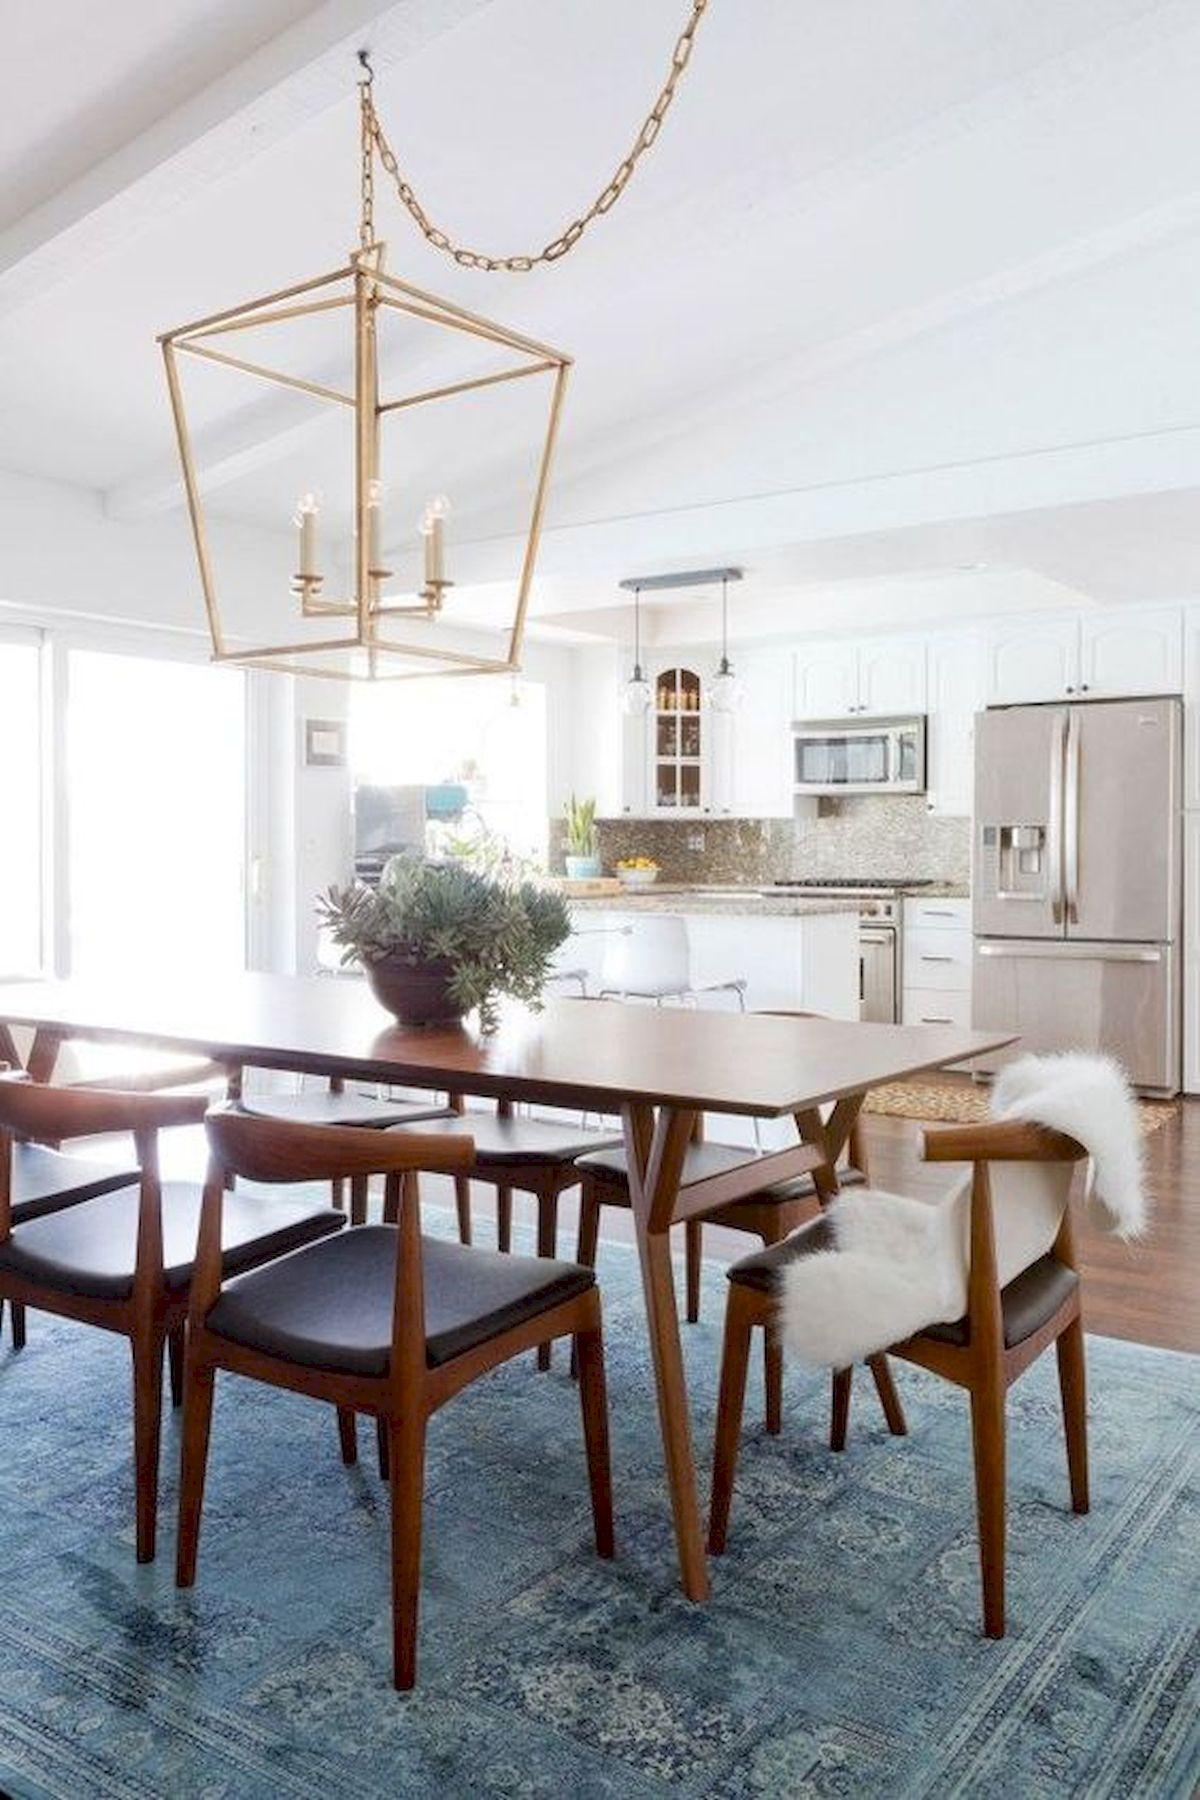 80 Elegant Modern Dining Room Design And Decor Ideas (60)